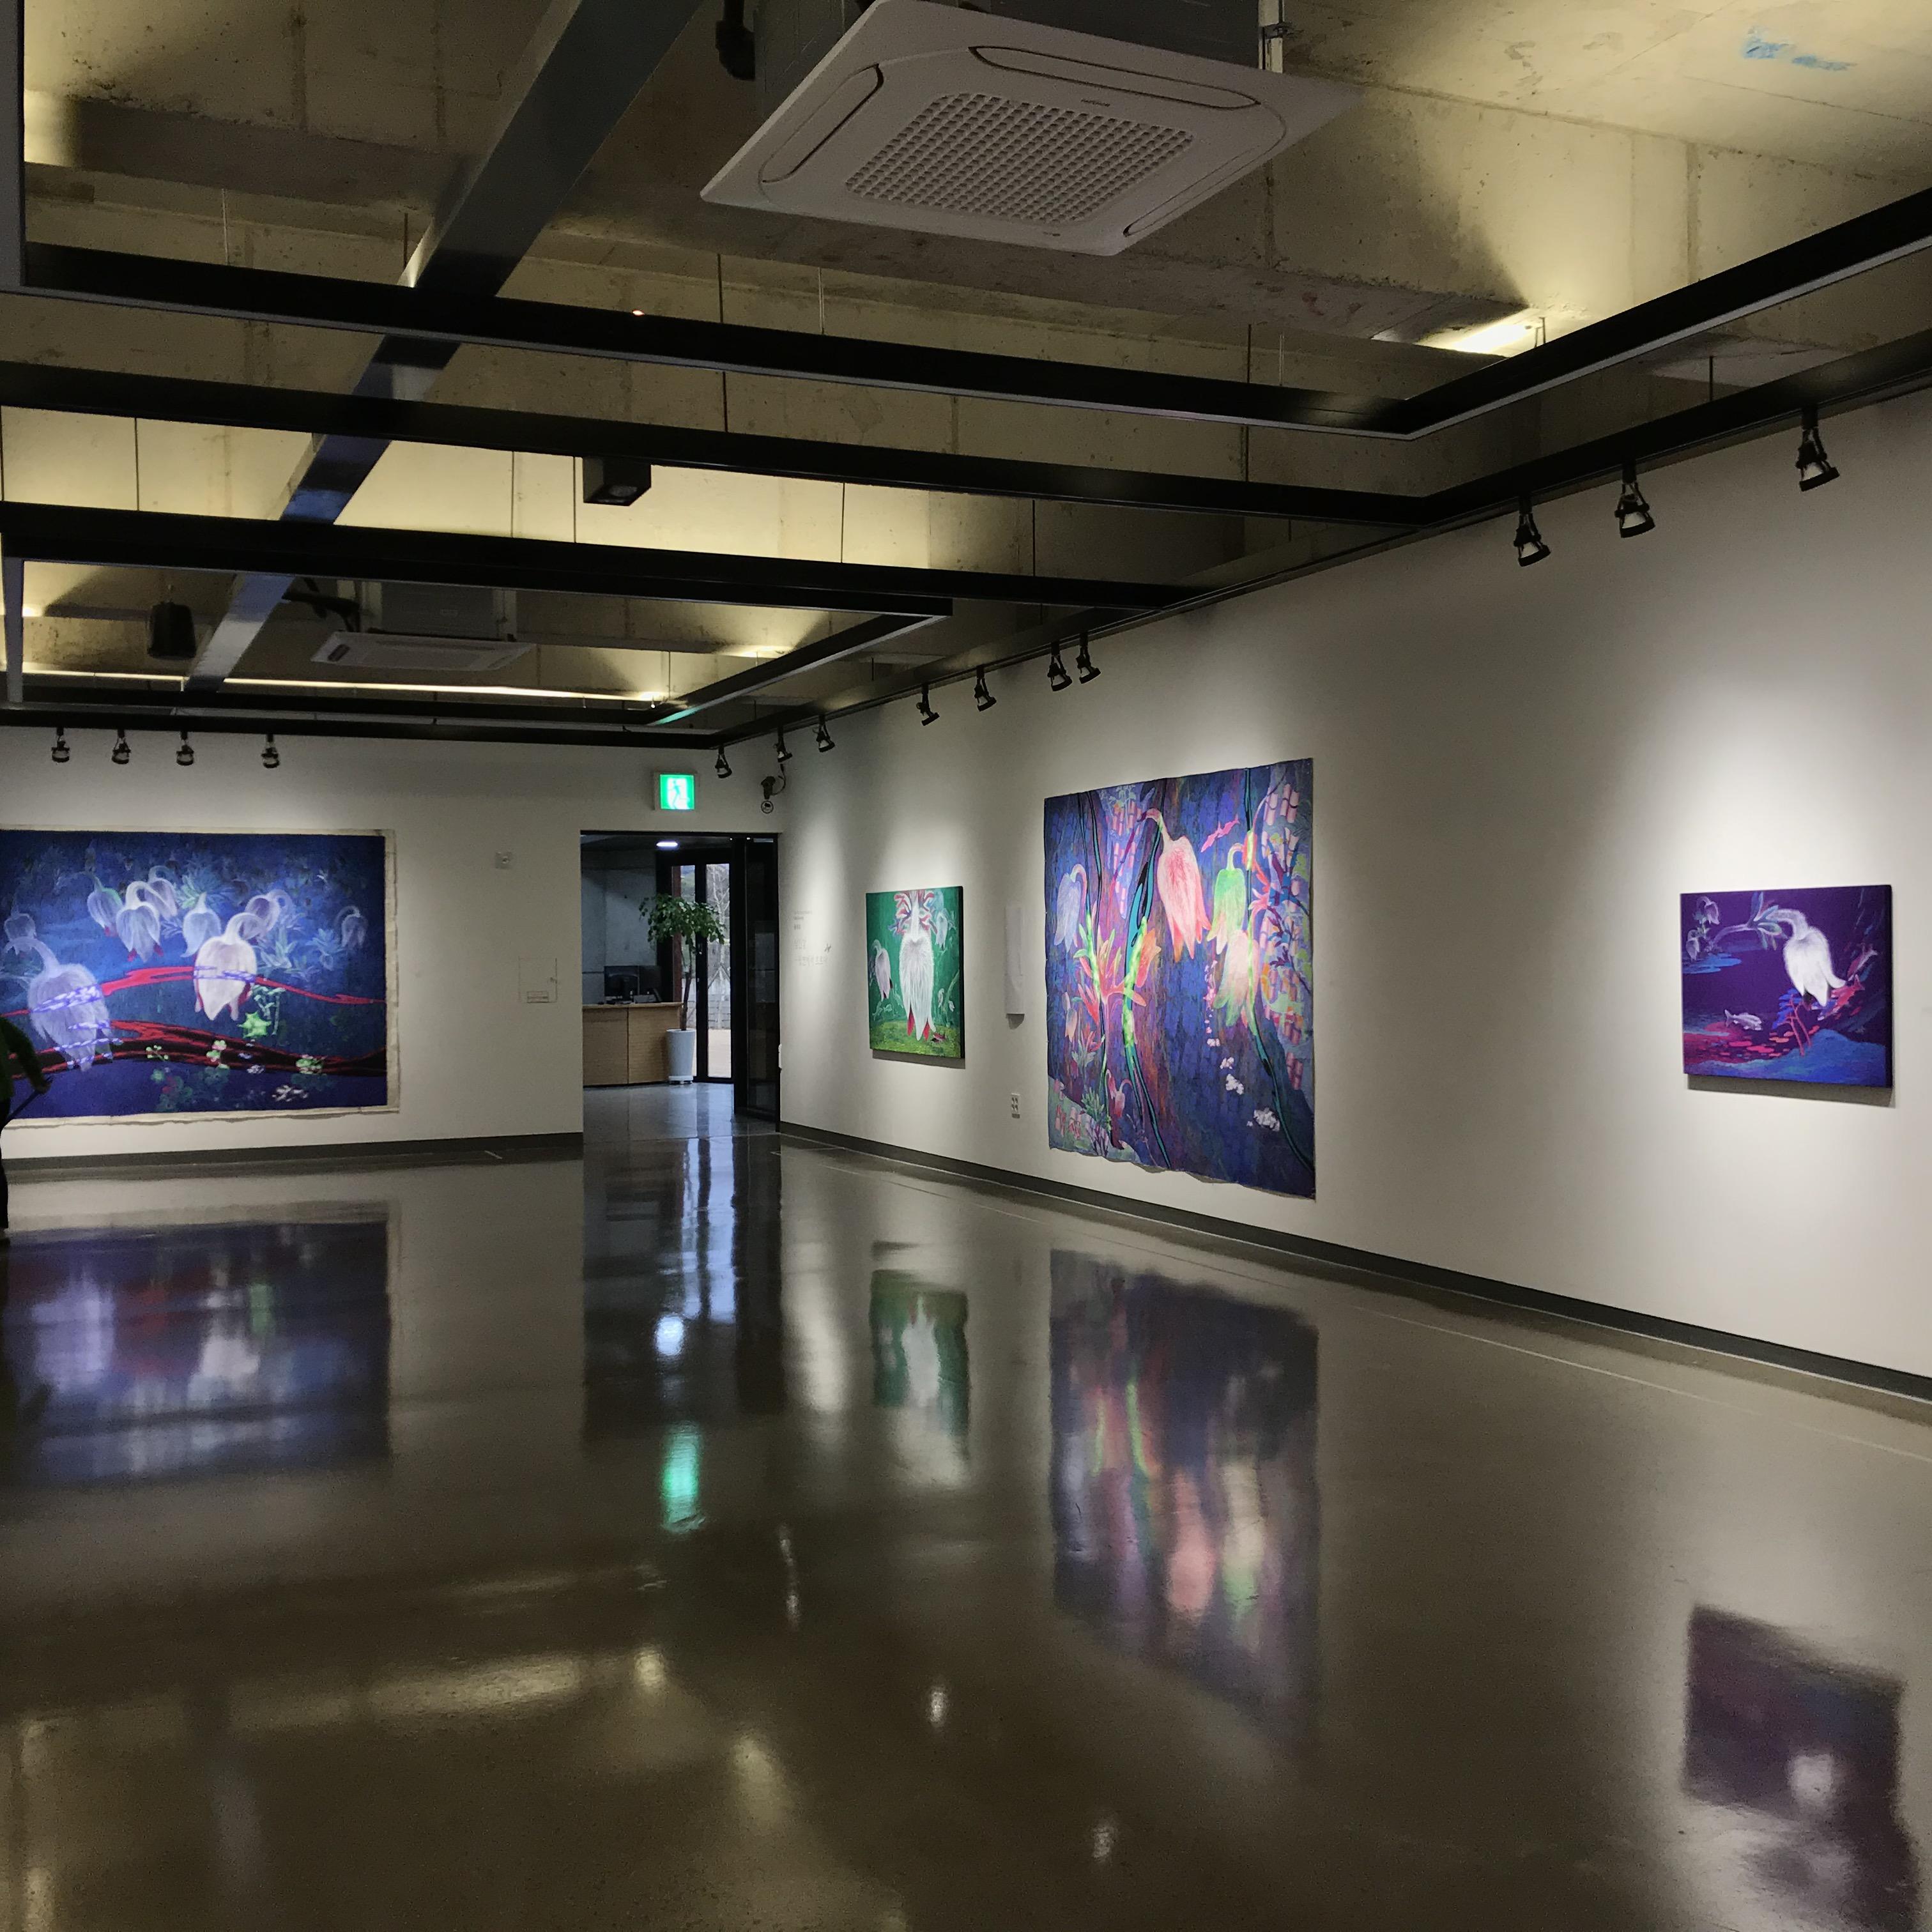 http://deyoungmuseum.co.kr/bs/se2/imgup/1590221258KakaoTalk_20200523_152255435.jpg